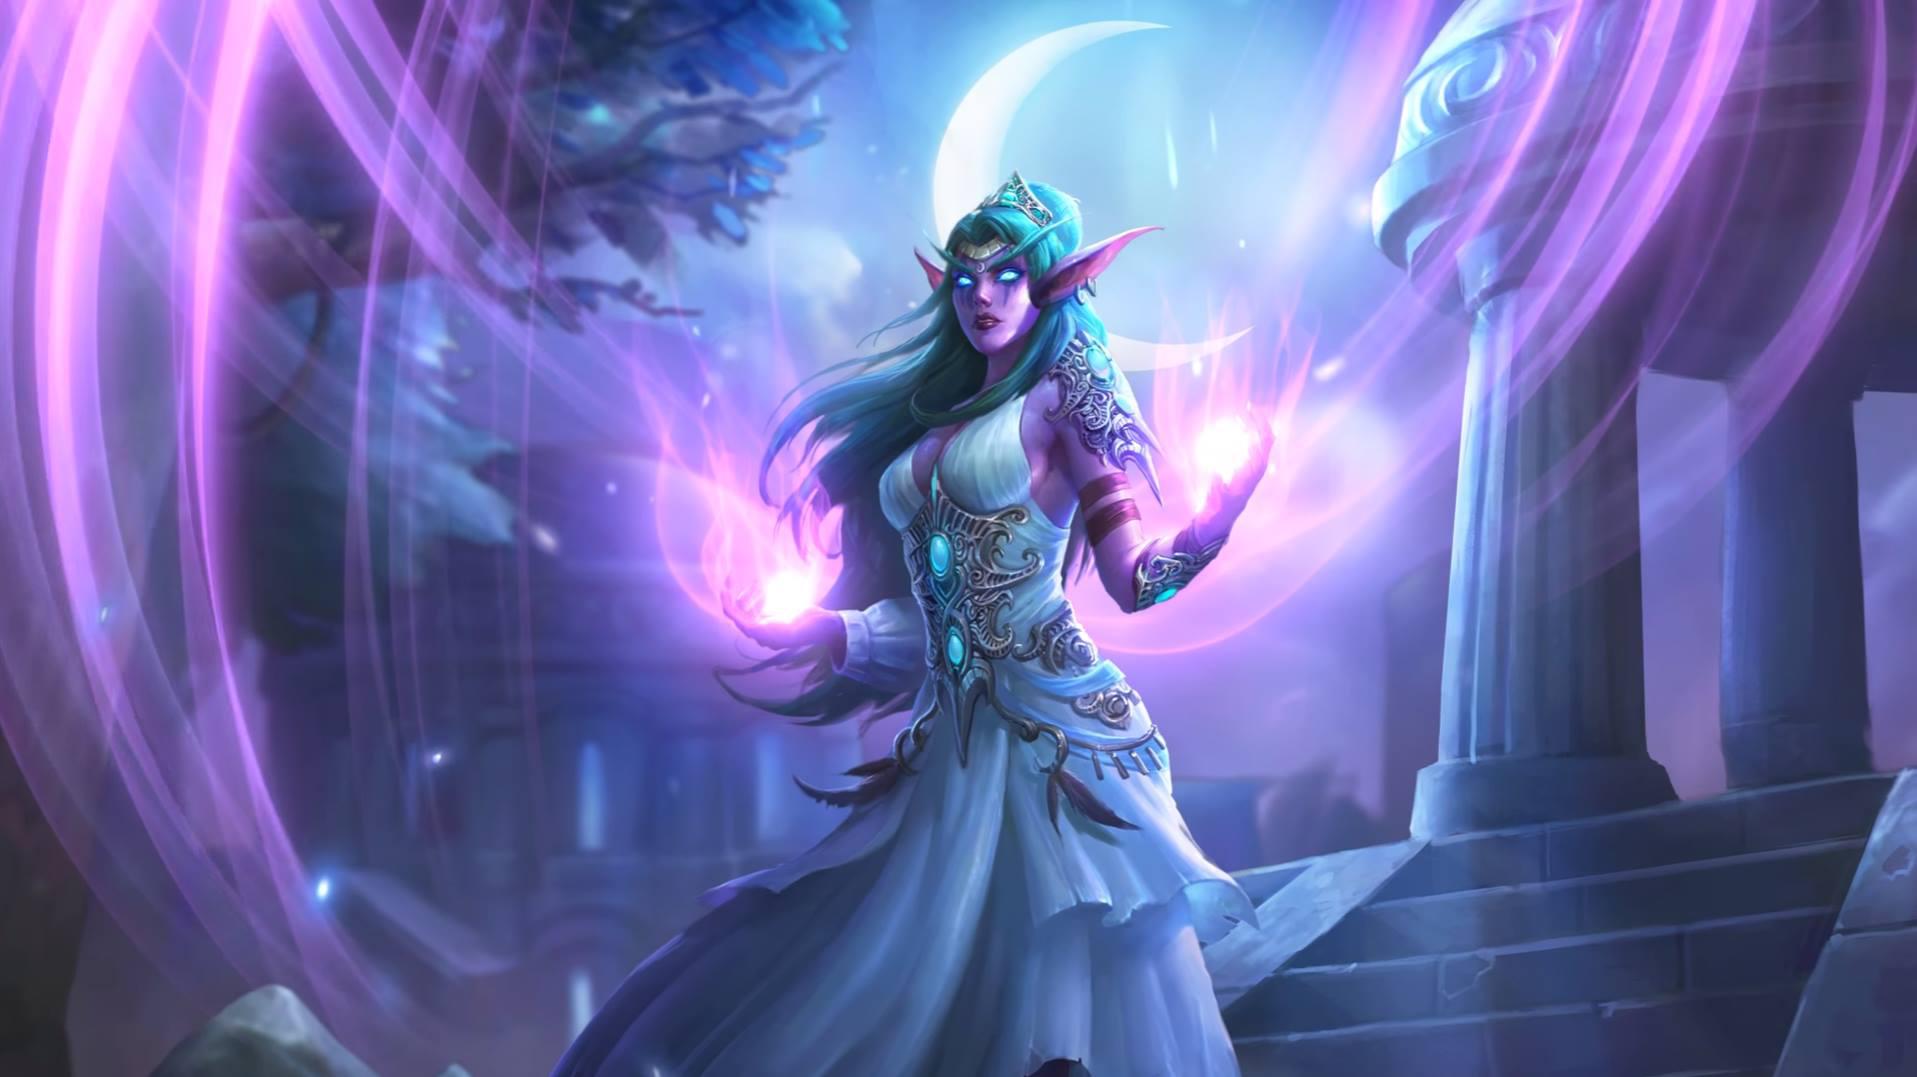 Hero Tyrande Whisperwind Artist Blizzard Entertainment World Of Warcraft Characters World Of Warcraft World Of Warcraft 3 Heroes of the storm beta developed by: hero tyrande whisperwind artist